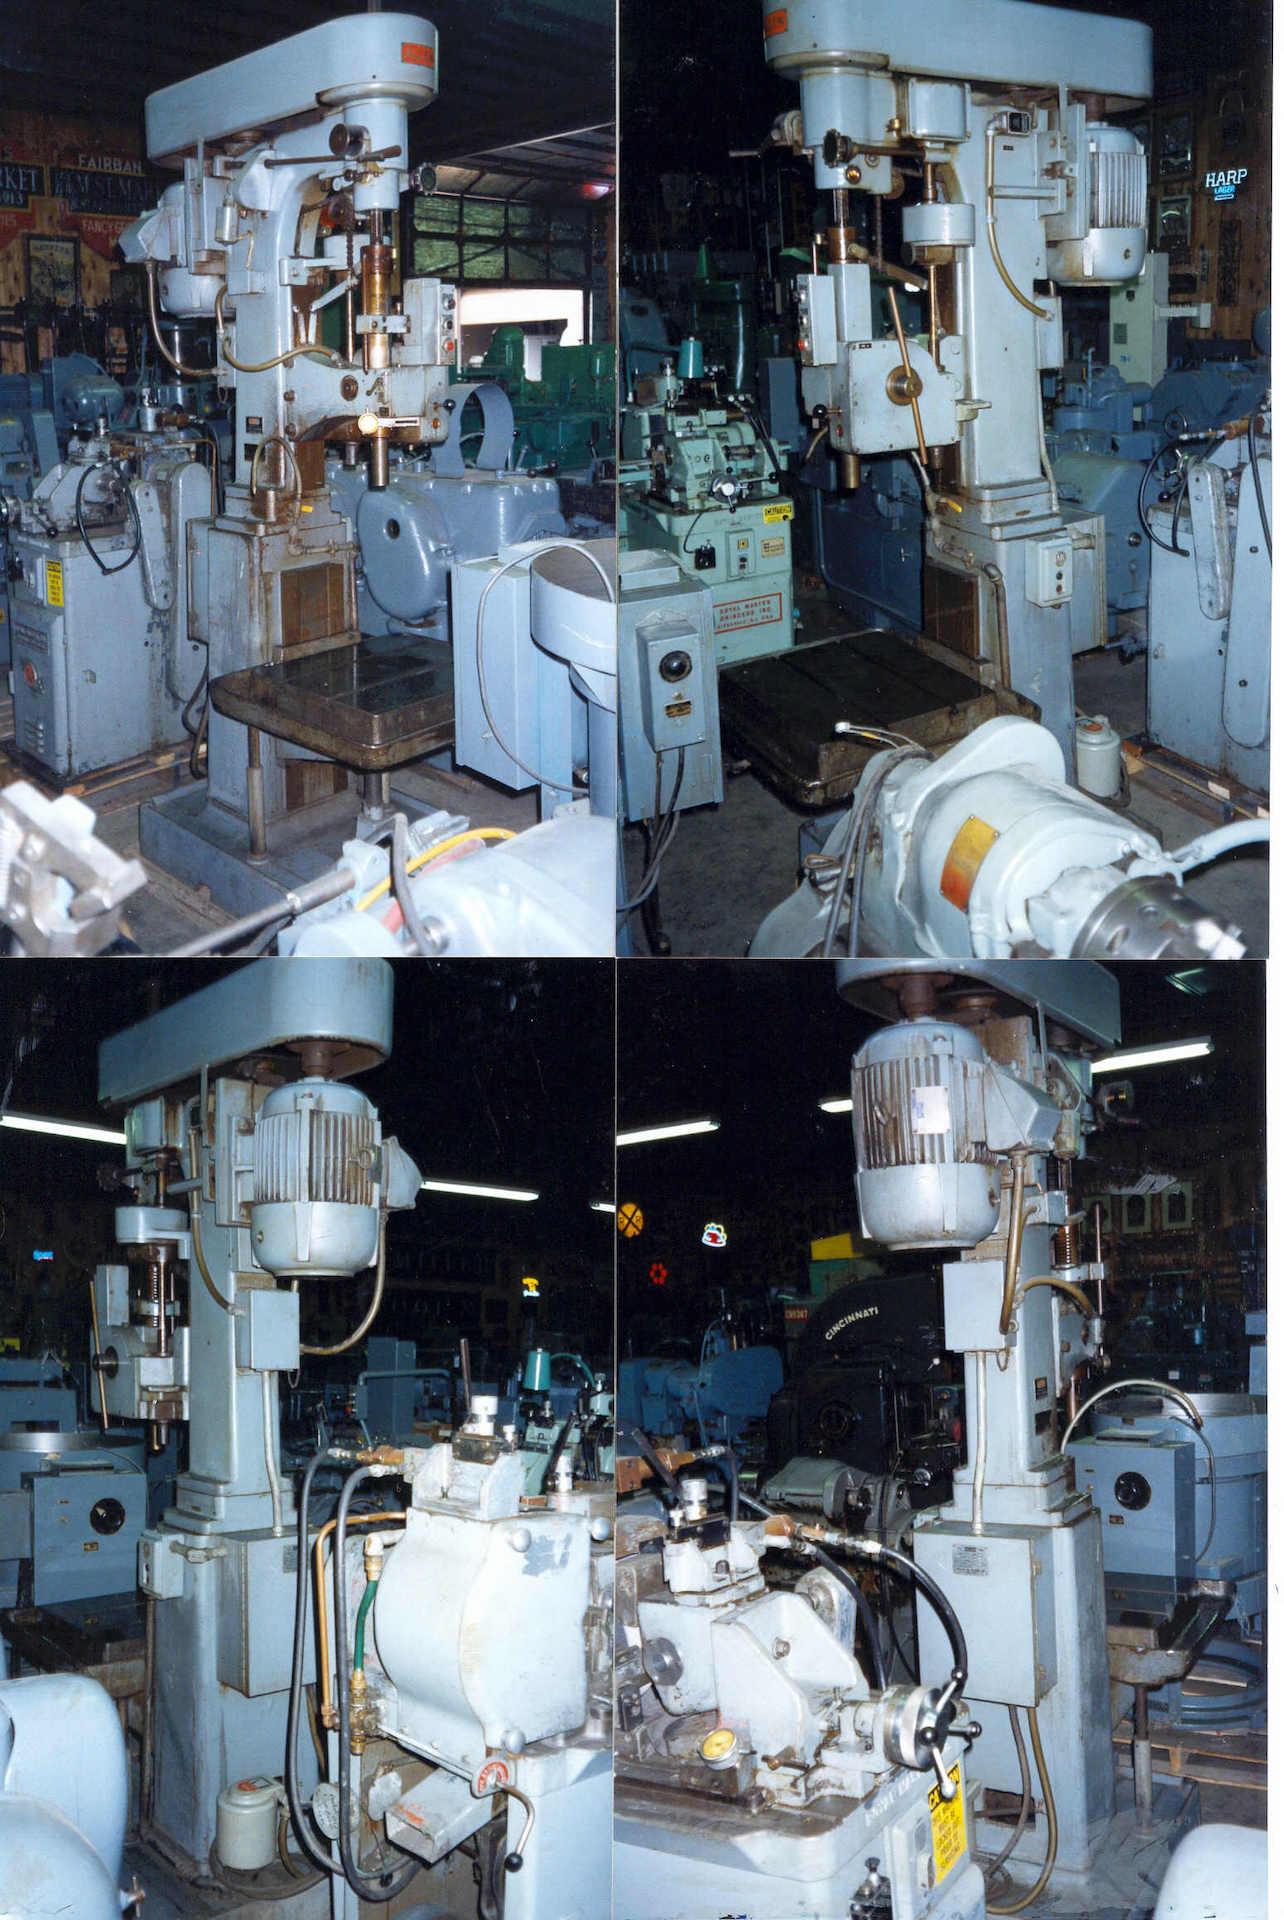 ALLEN SINGLE SPINDLE DRILL PRESS, SER# VCDW32421, MFG-1966, 50-1800 RPM, #4 Morse Taper, 5 Hp, Power